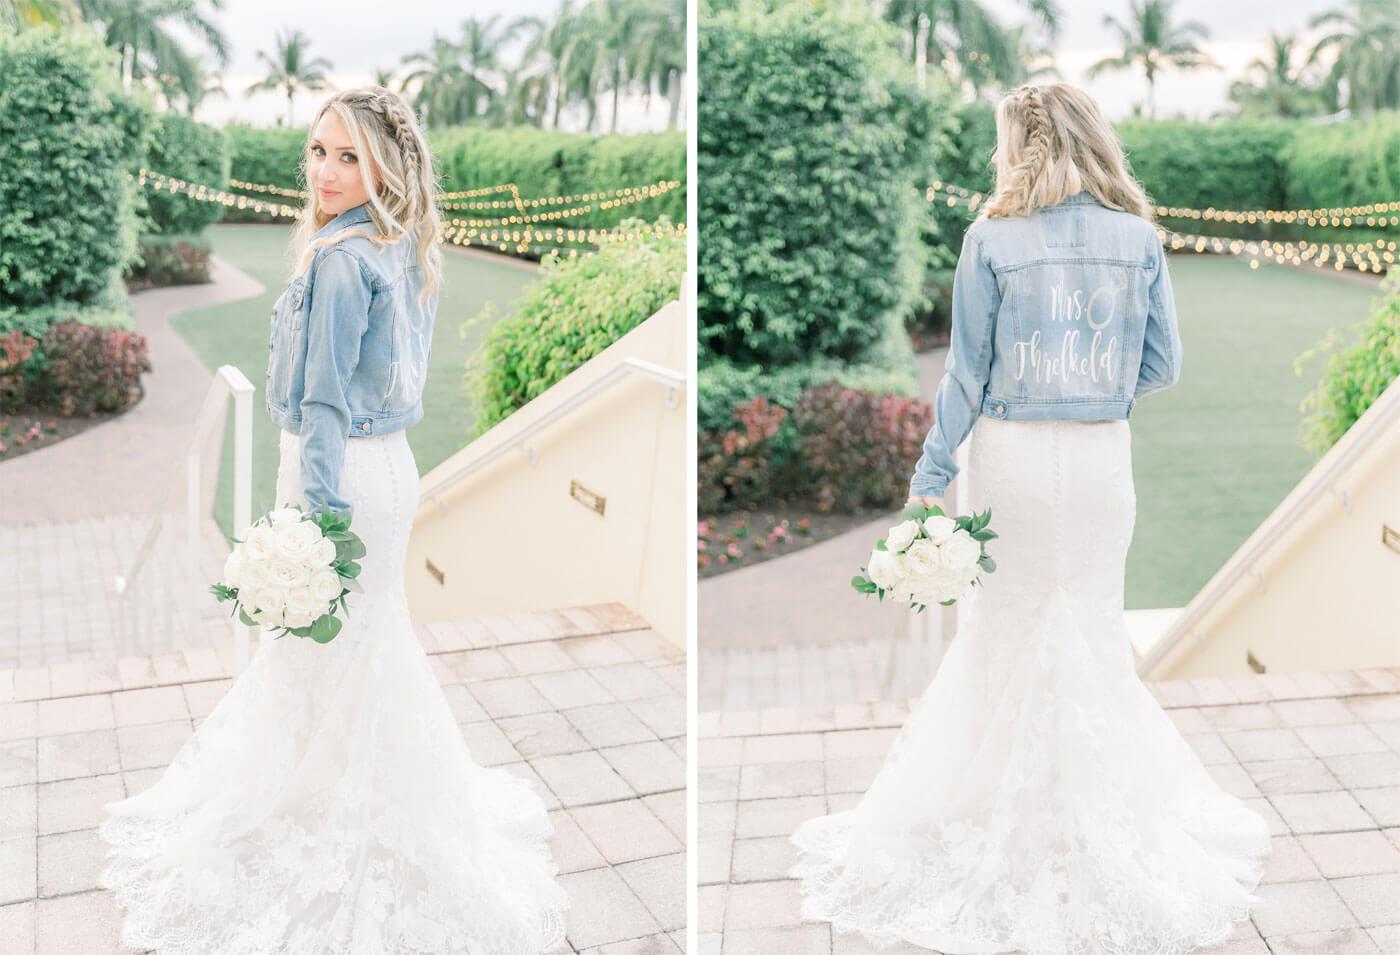 Brautkleid Jeansjacke